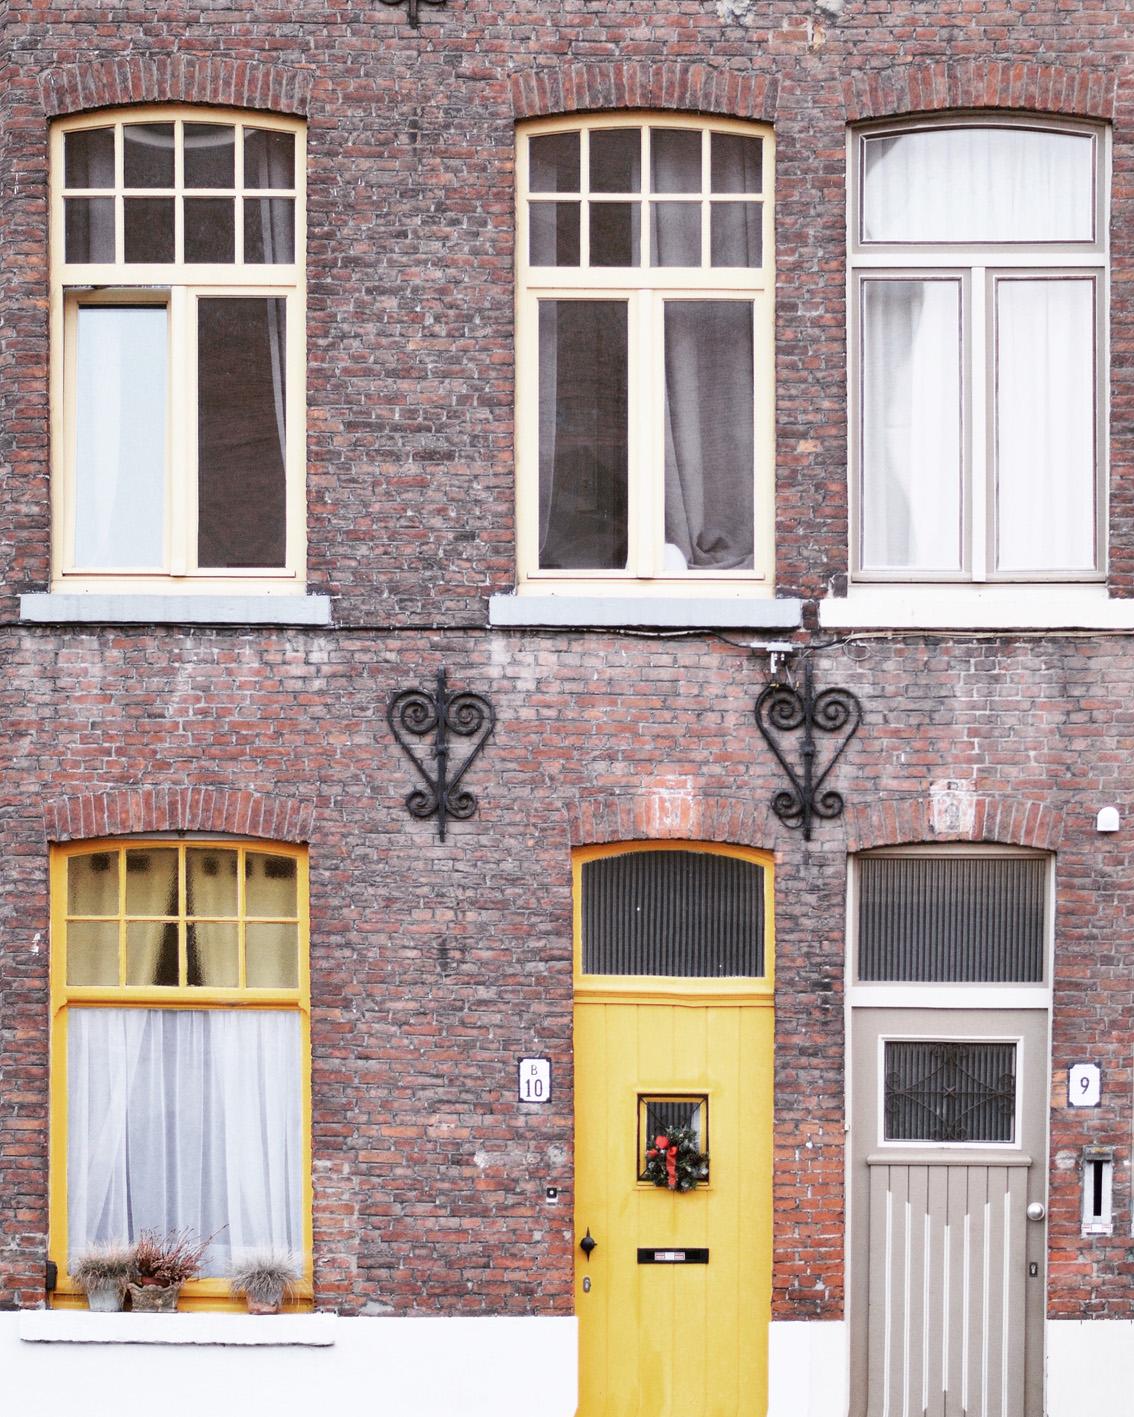 47-1 Un weekend in Belgio. Alla scoperta delle Fiandre: Bruges .